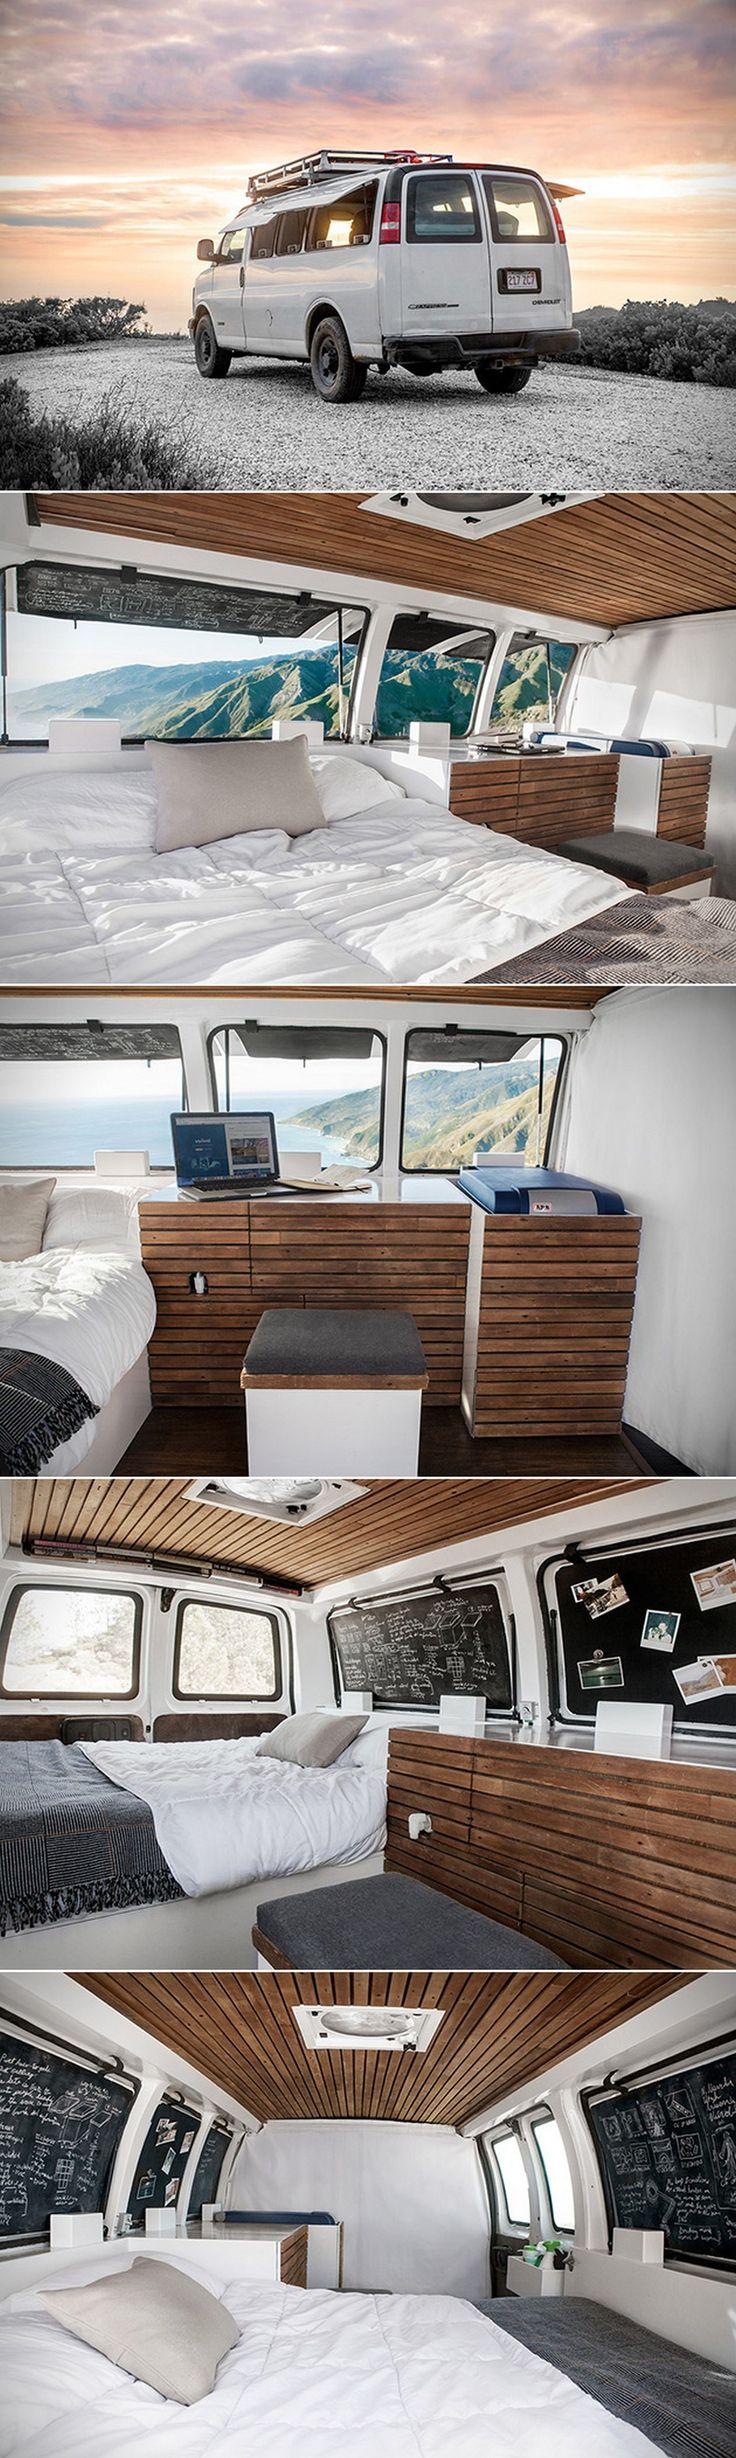 50 Cool And Fresh Ideas Van Life Interior Design (36)